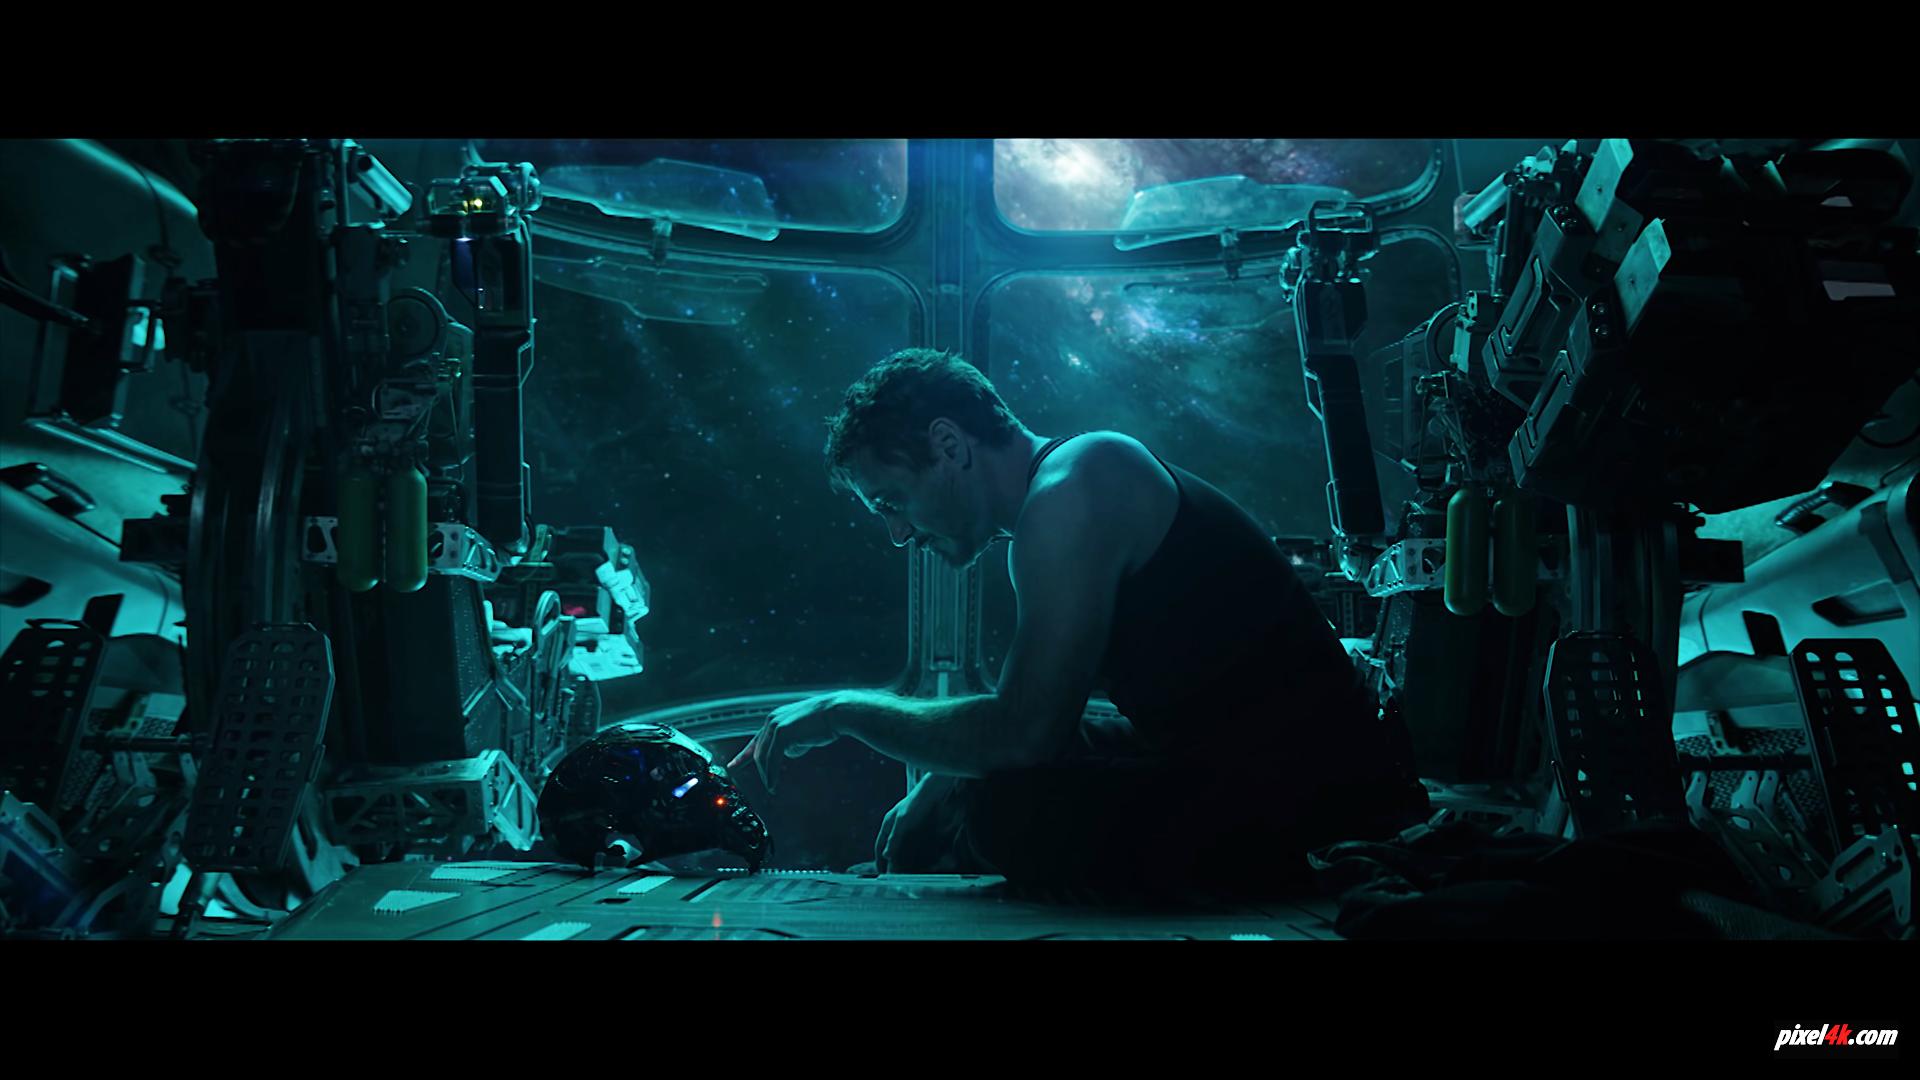 Tony Stark 4k Wallpaper: Avengers 4 End Game Tony Stark HD Wallpapers Avengers End